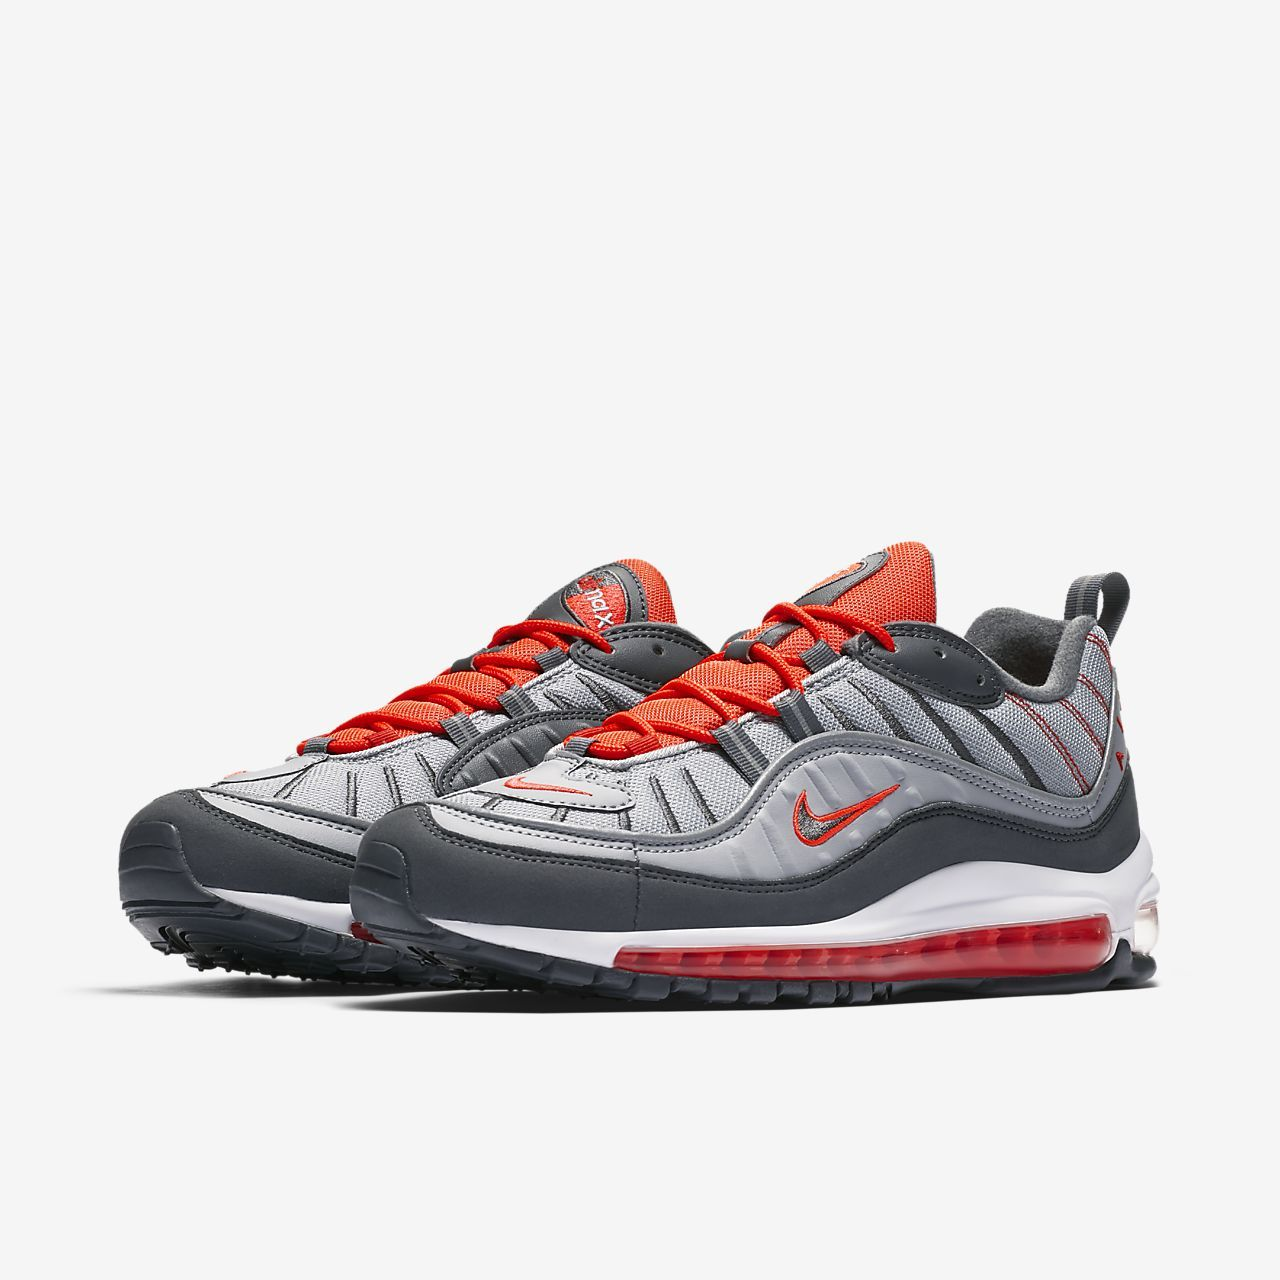 100% authentic a4319 01e85 Nike Air Max 98 Mens Shoe